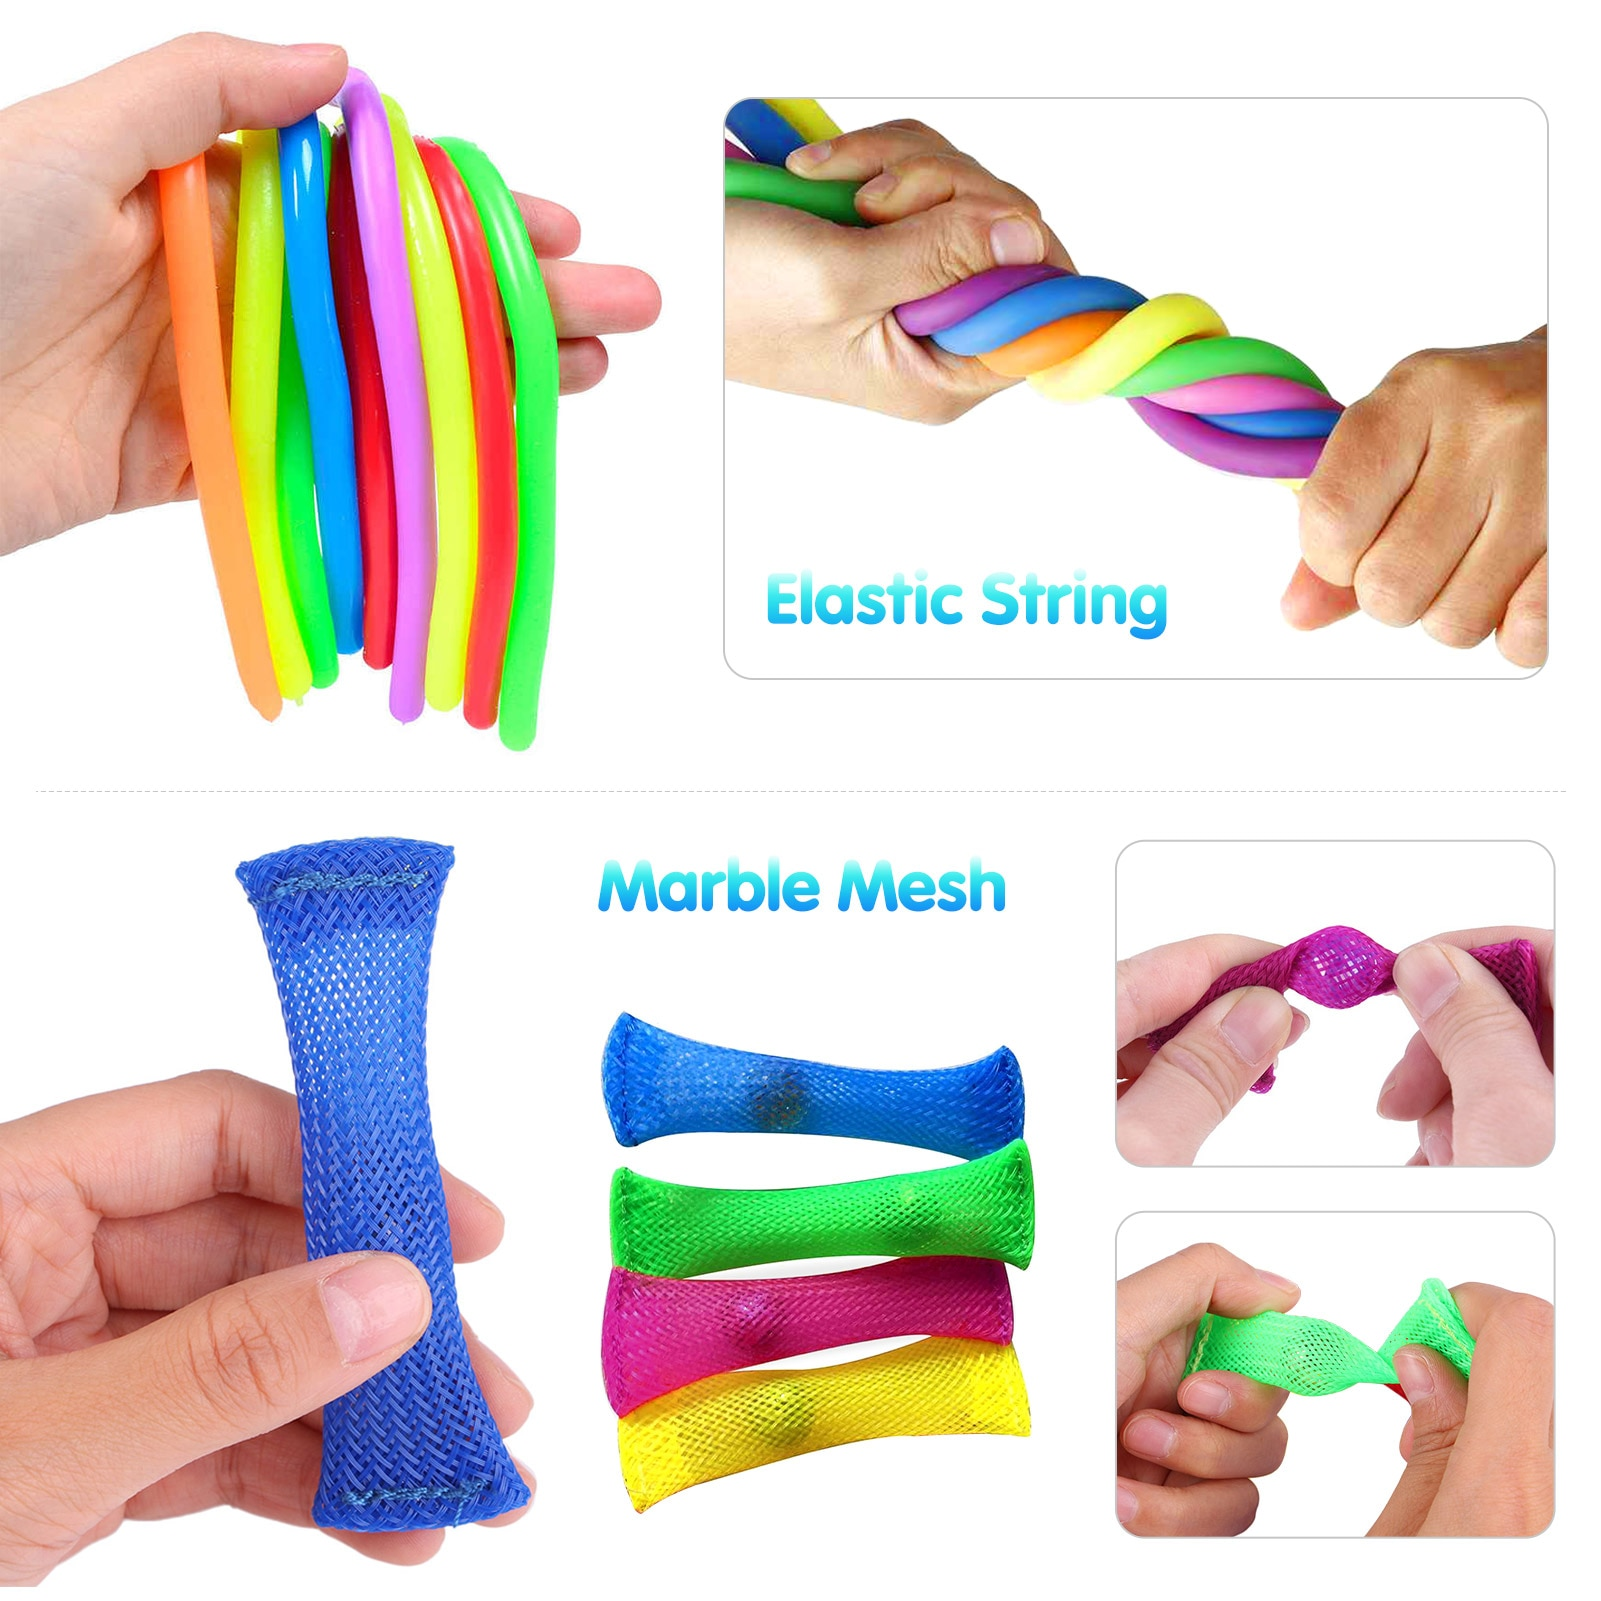 23Pcs Fidget Toys Set Stretchy Strings Key Chain Anti-stress Relief Gift Adults Kids Sensory Stress Relief Pop it Fidget Toys enlarge